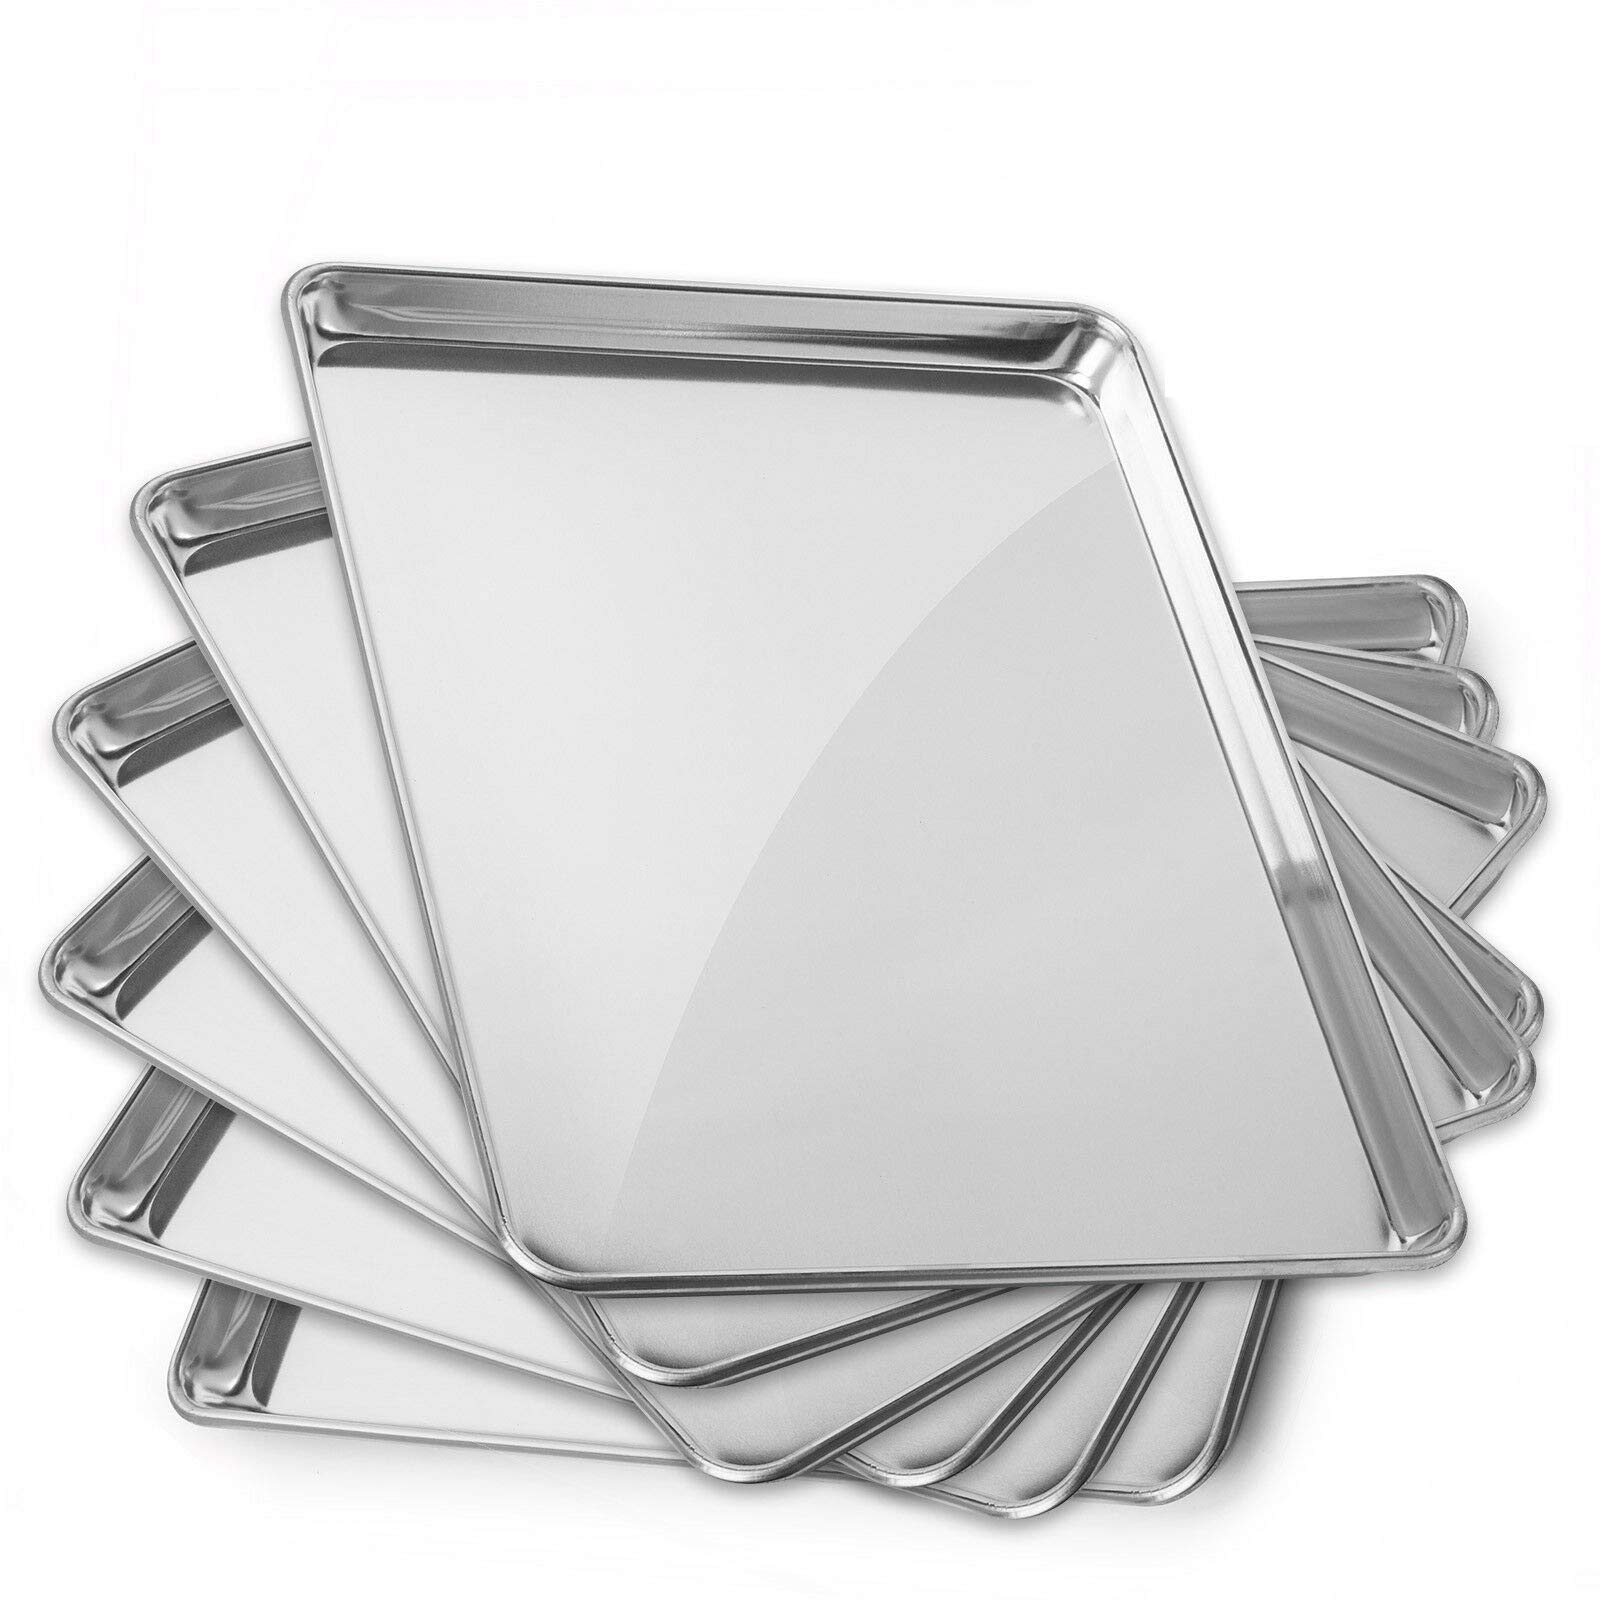 6 Pans Aluminum Baking Pans 15 x 21 Inch #MWMN